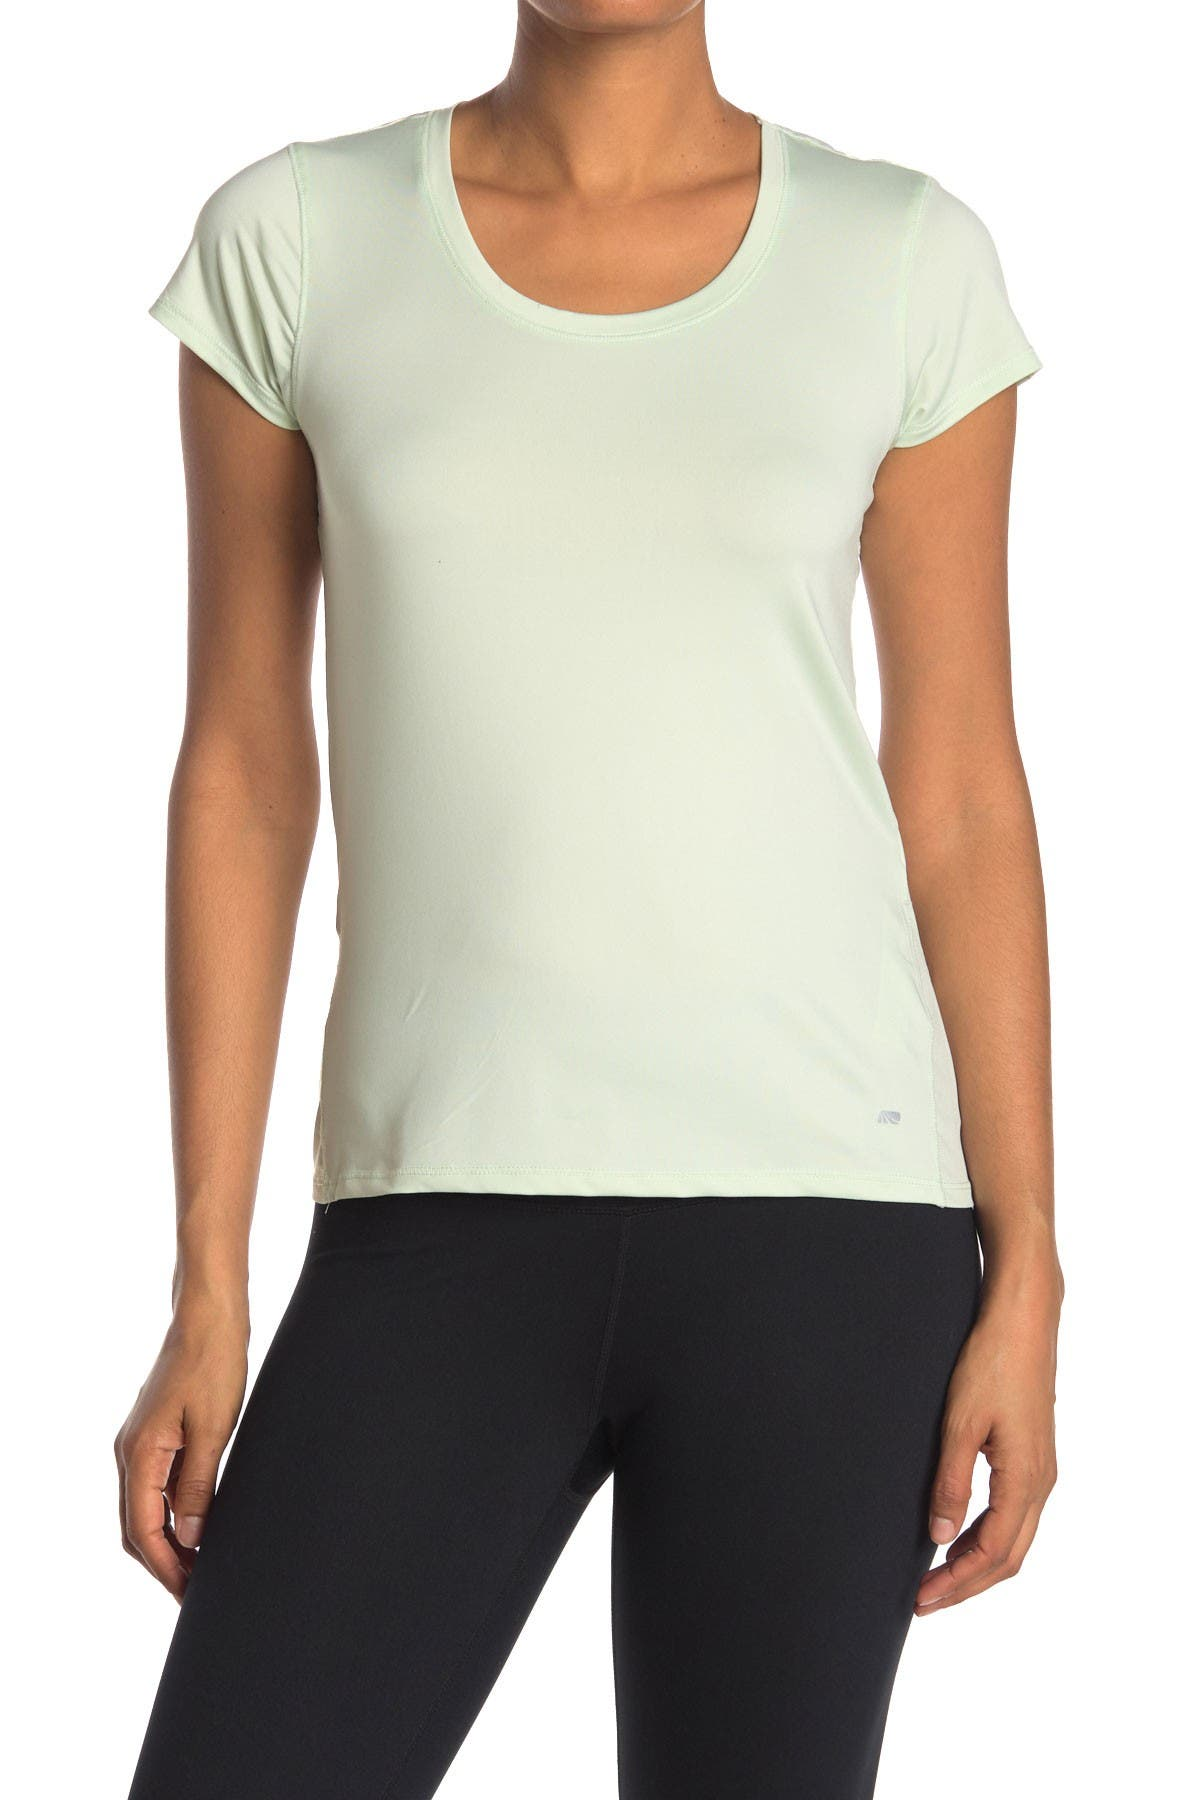 Image of Marika Trisha Scoop Neck T-Shirt